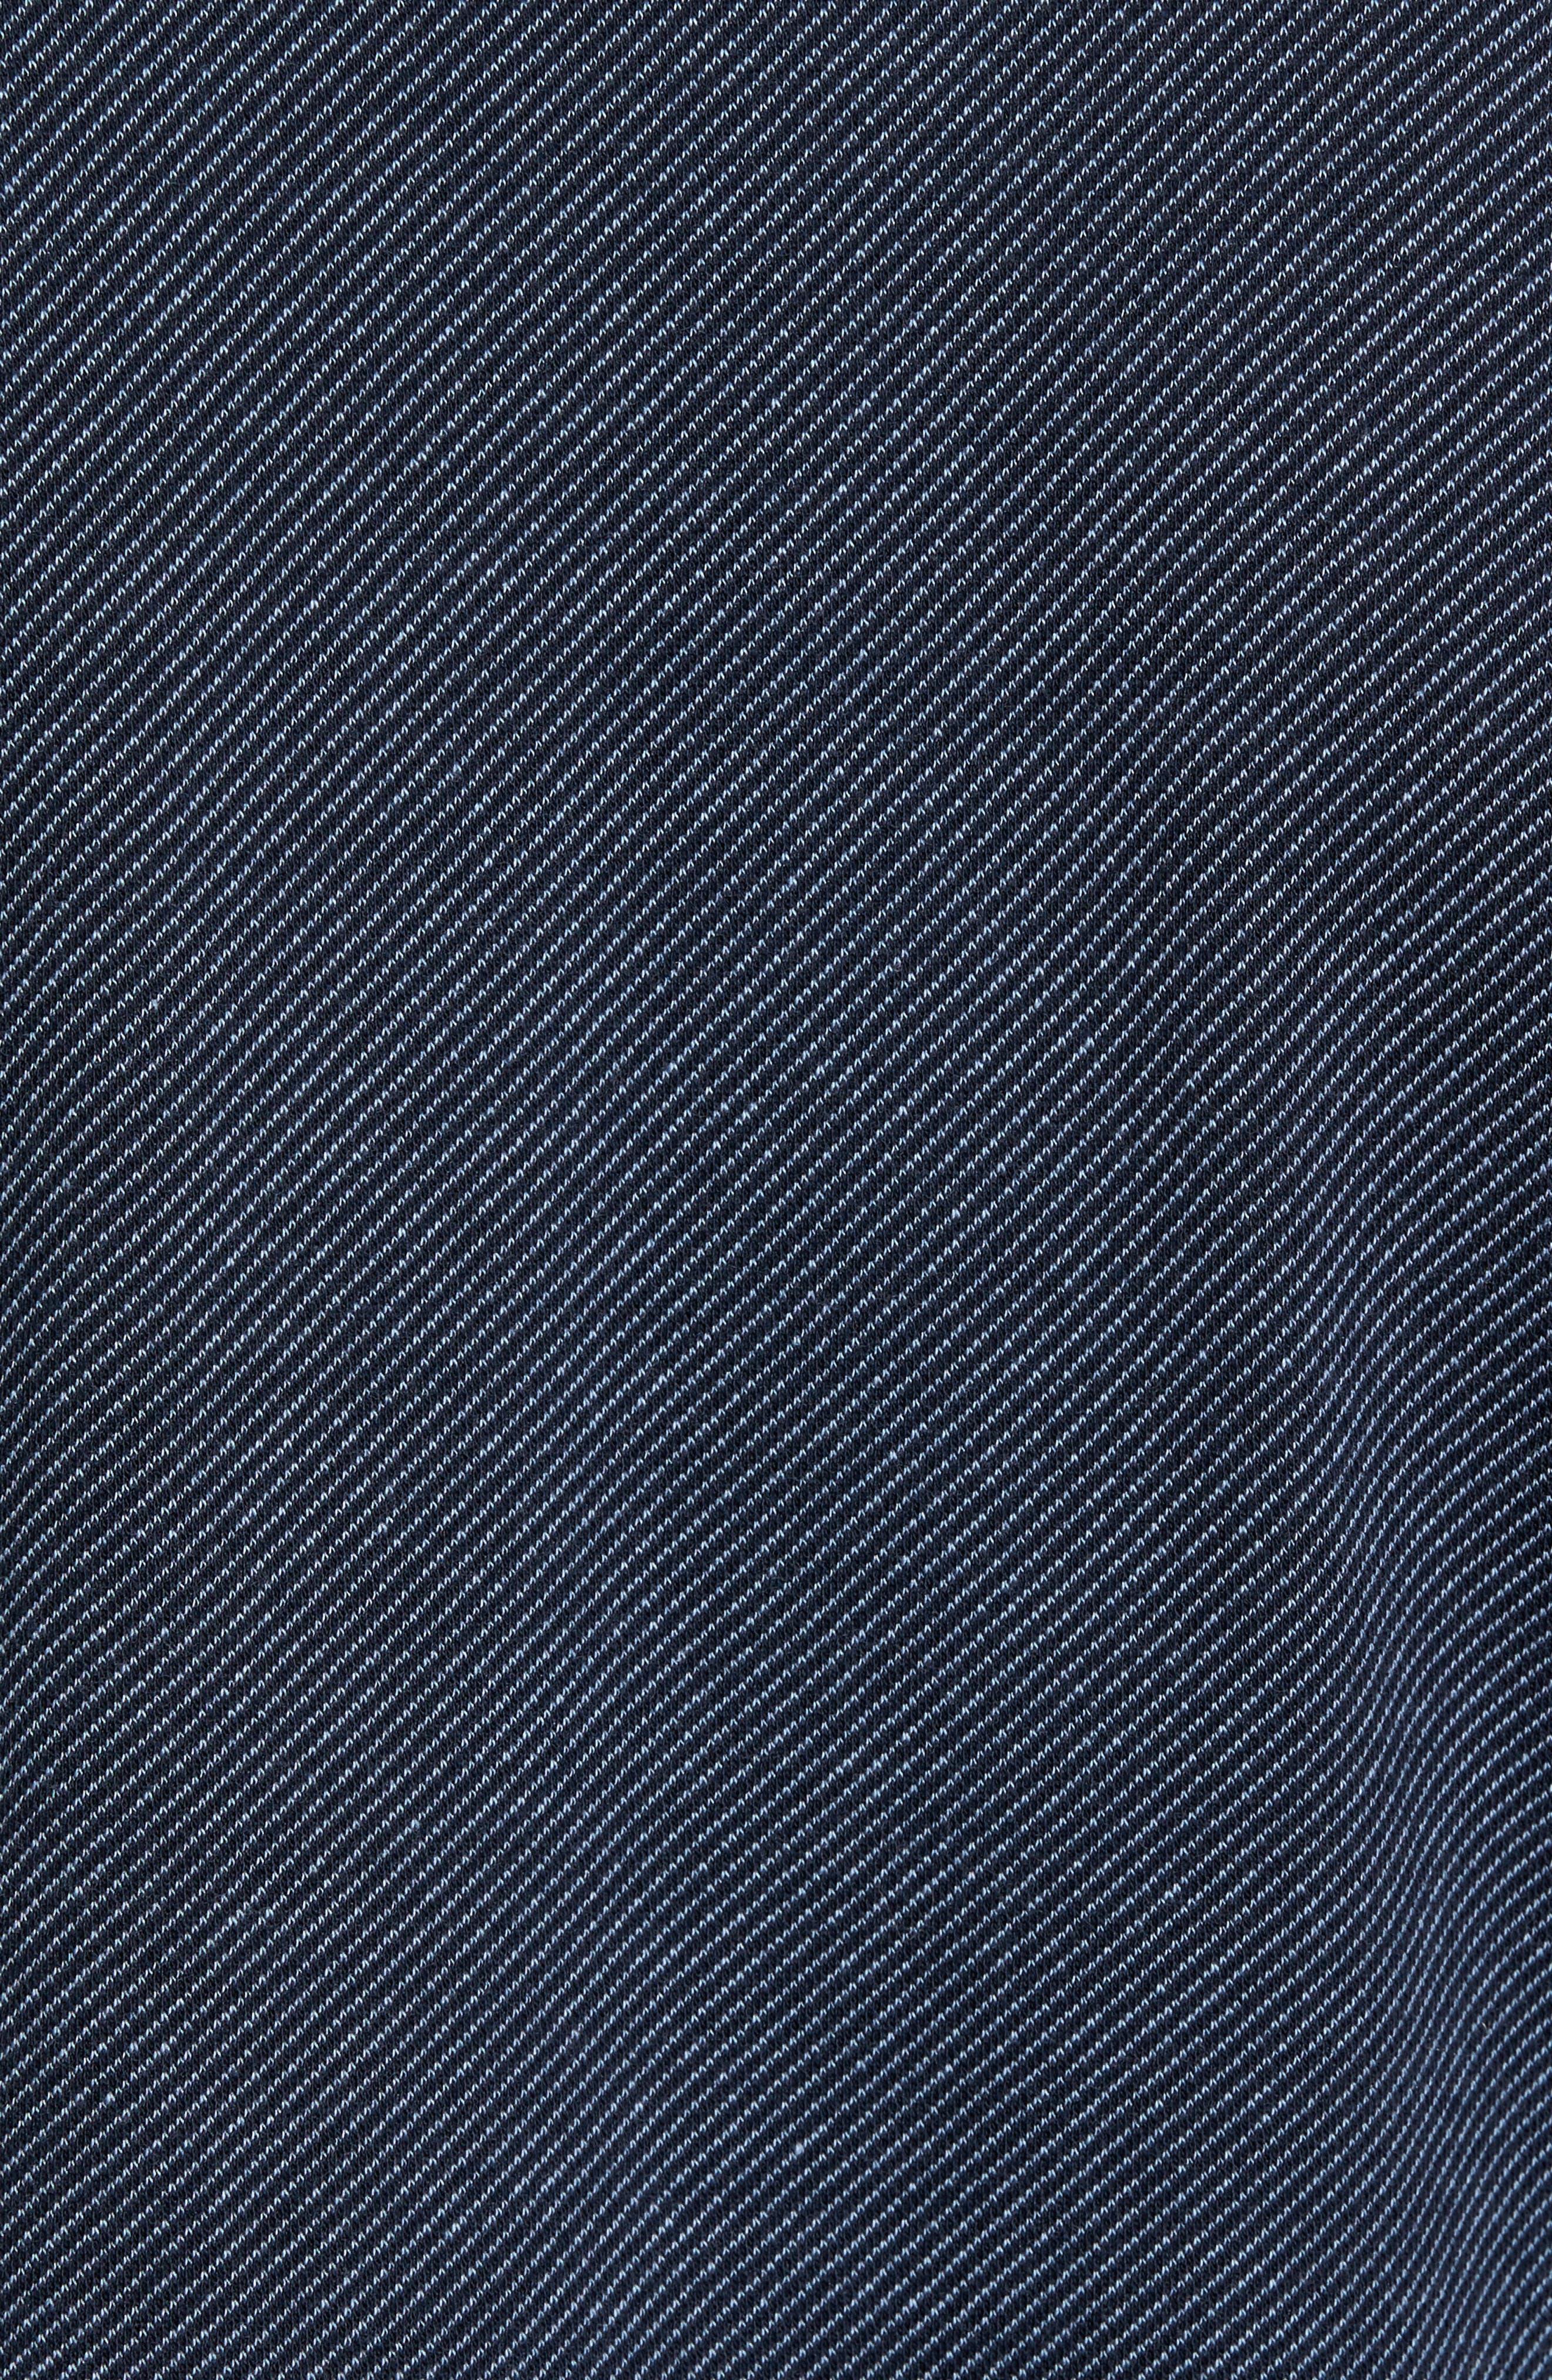 Alderson Ave Fleece Jacket,                             Alternate thumbnail 5, color,                             Navy